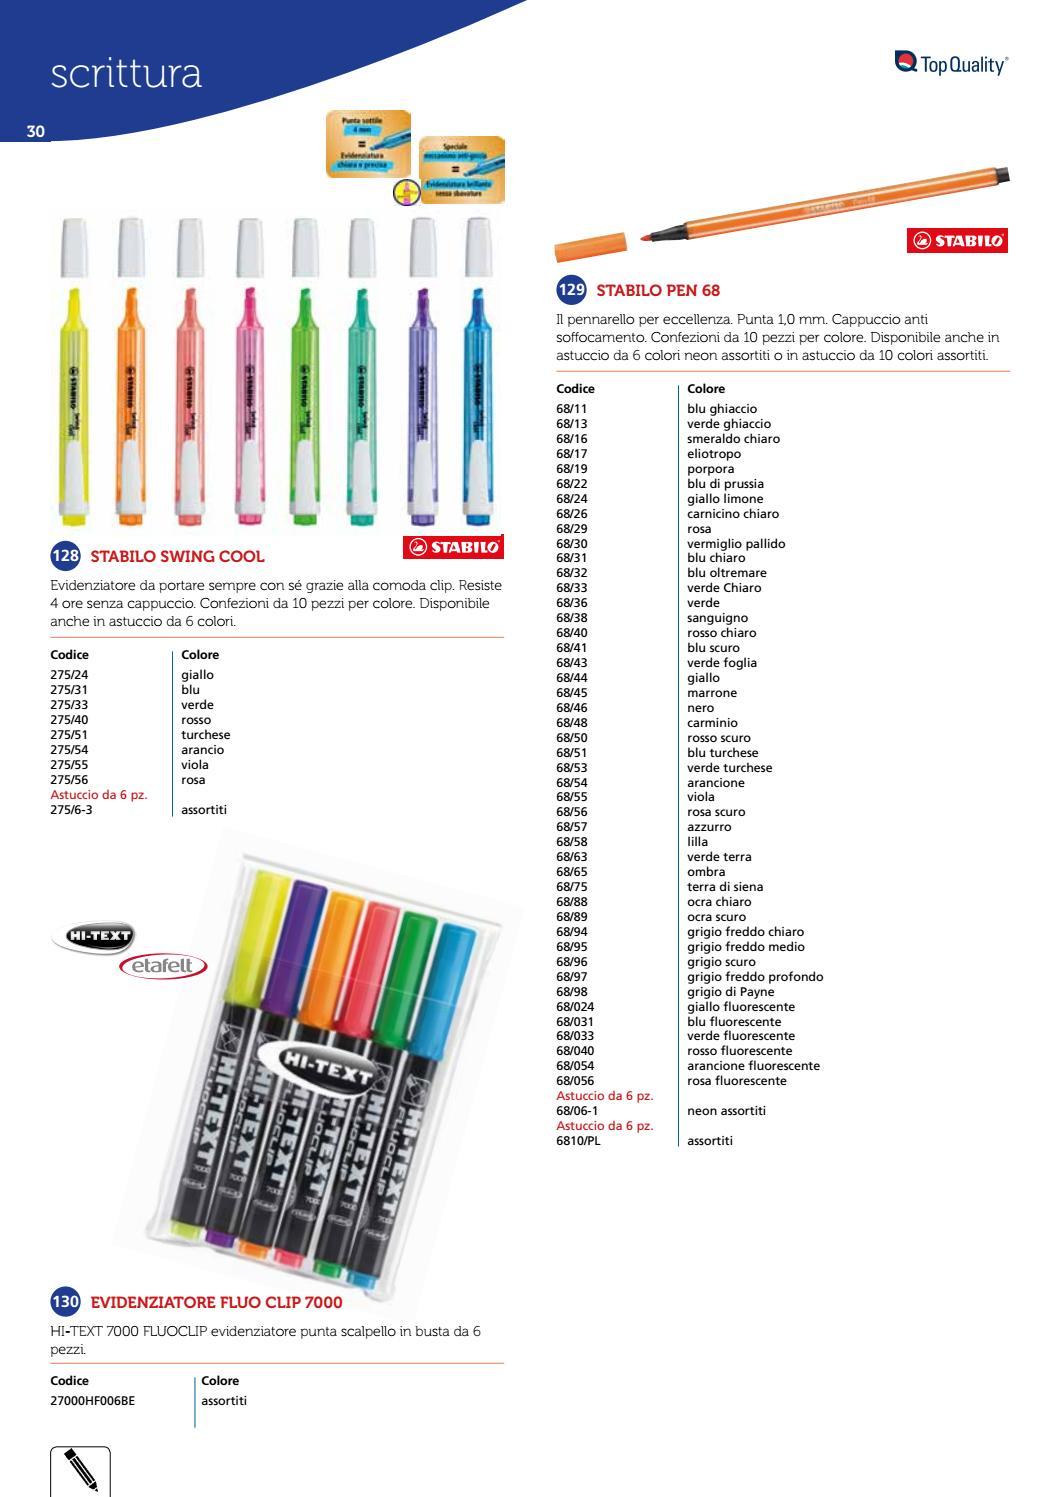 HI-TEXT 7000 FLUOCLIP evidenziatore punta scalpello Busta 5 pezzi colori assortiti